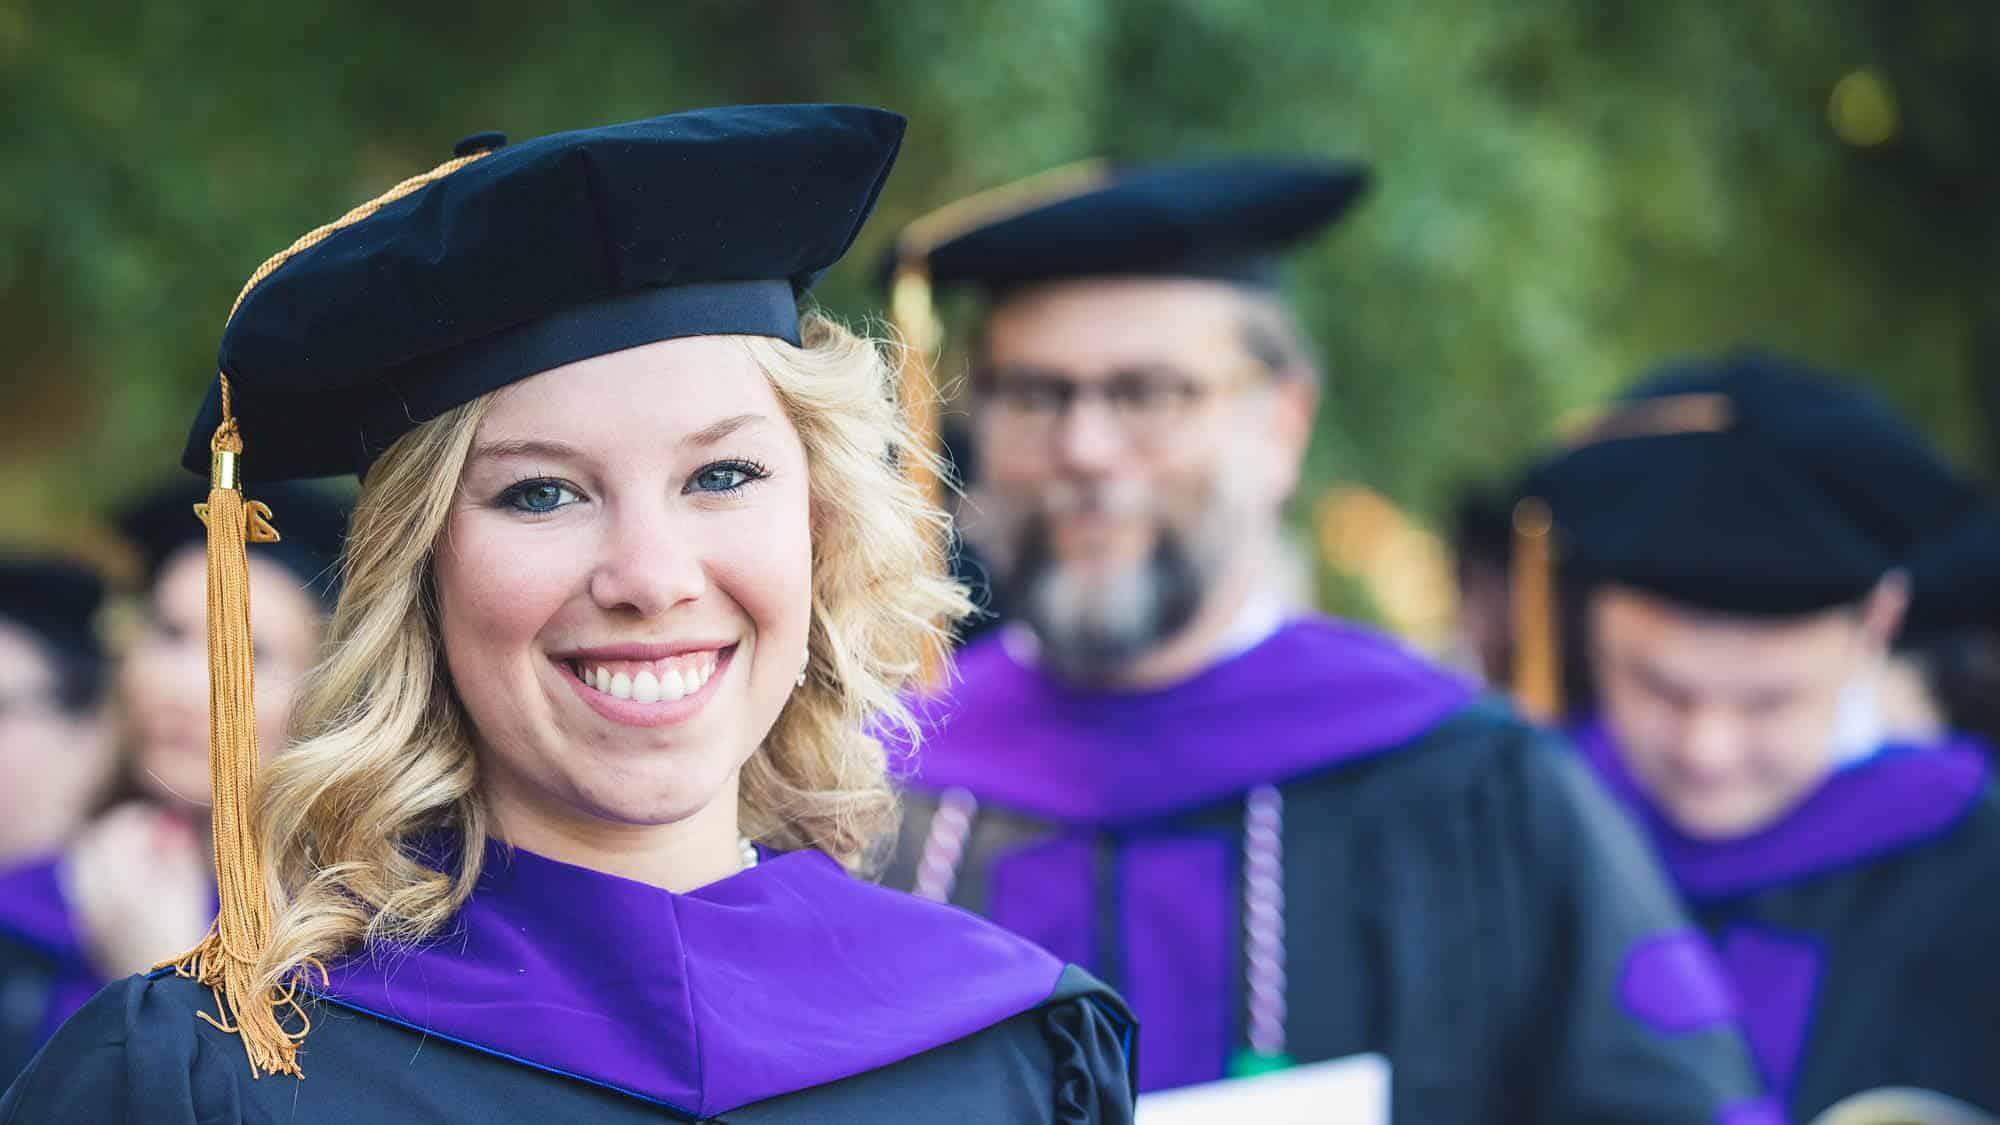 A graduate of Regent law school, Virginia Beach VA 23464.